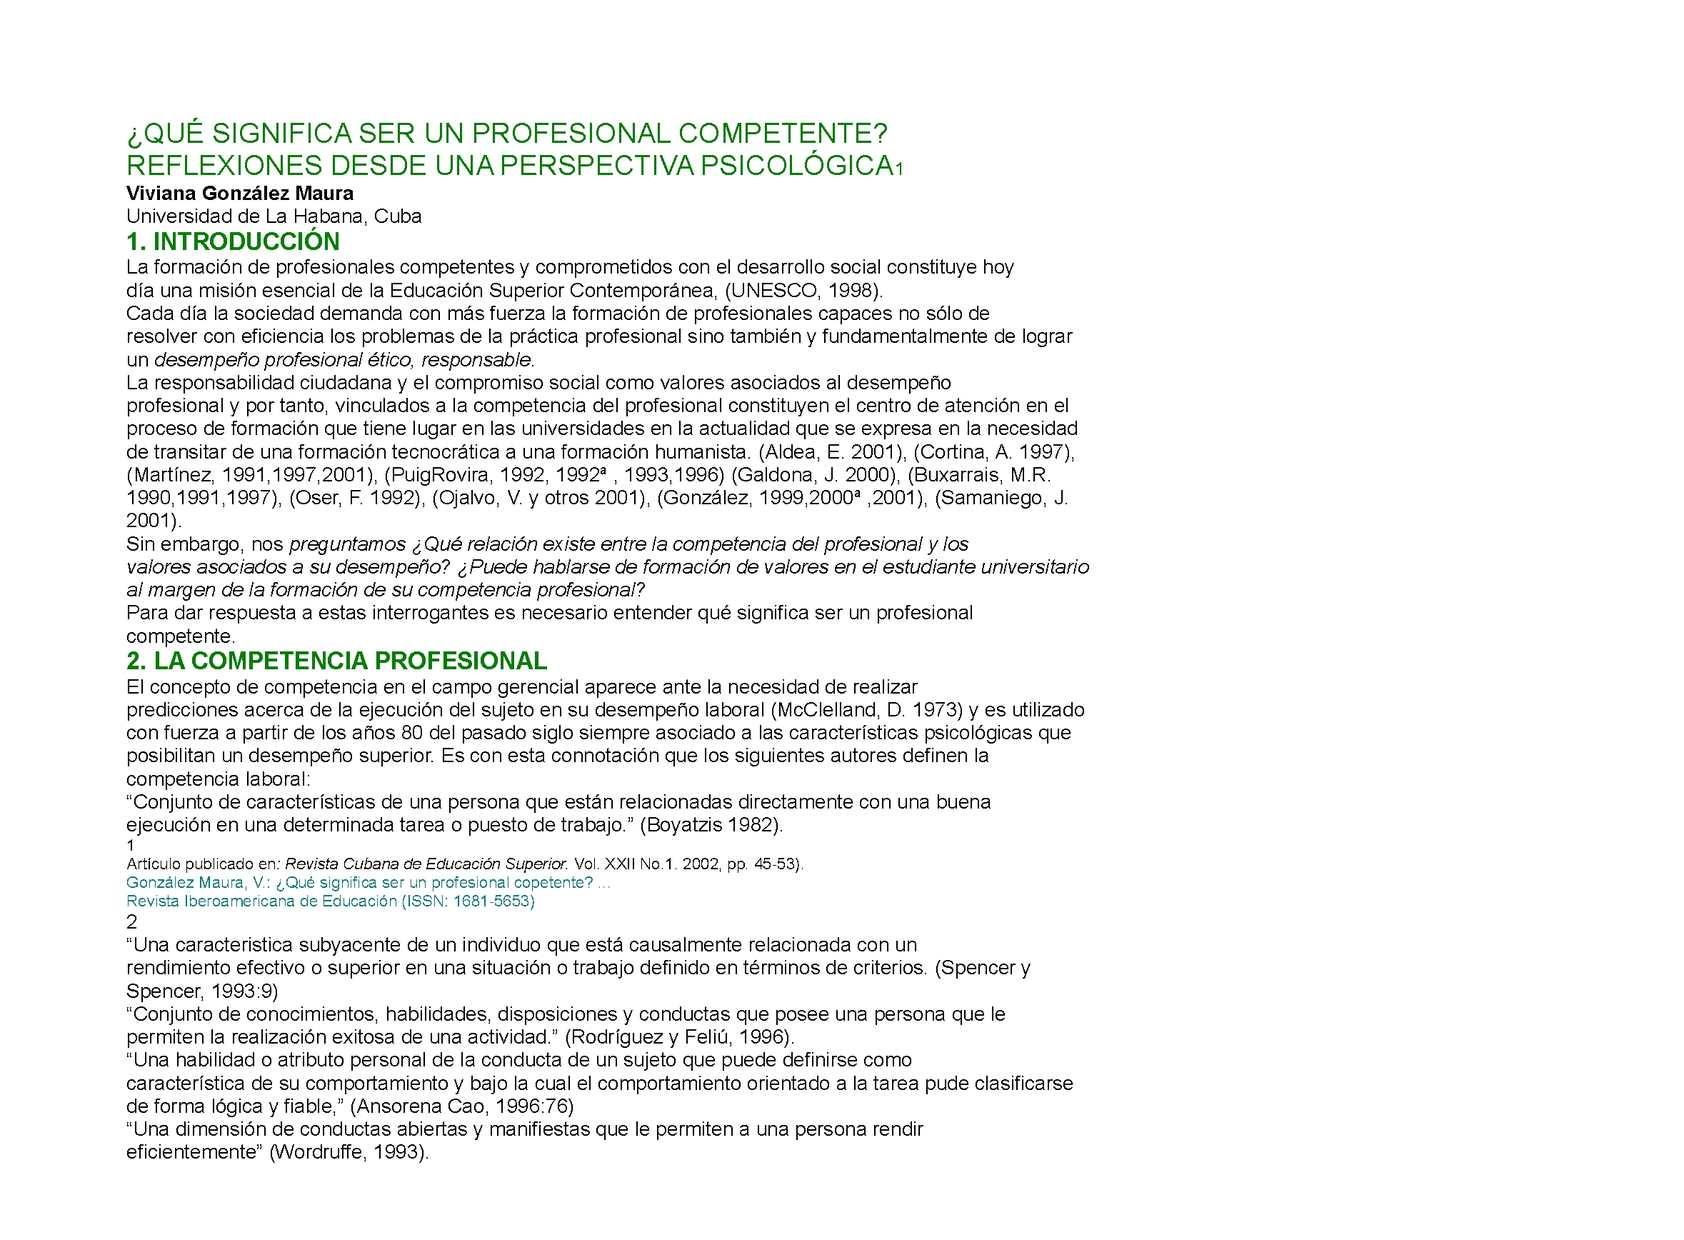 Calam o qu significa ser un profesional competente for Arquitectura para la educacion pdf